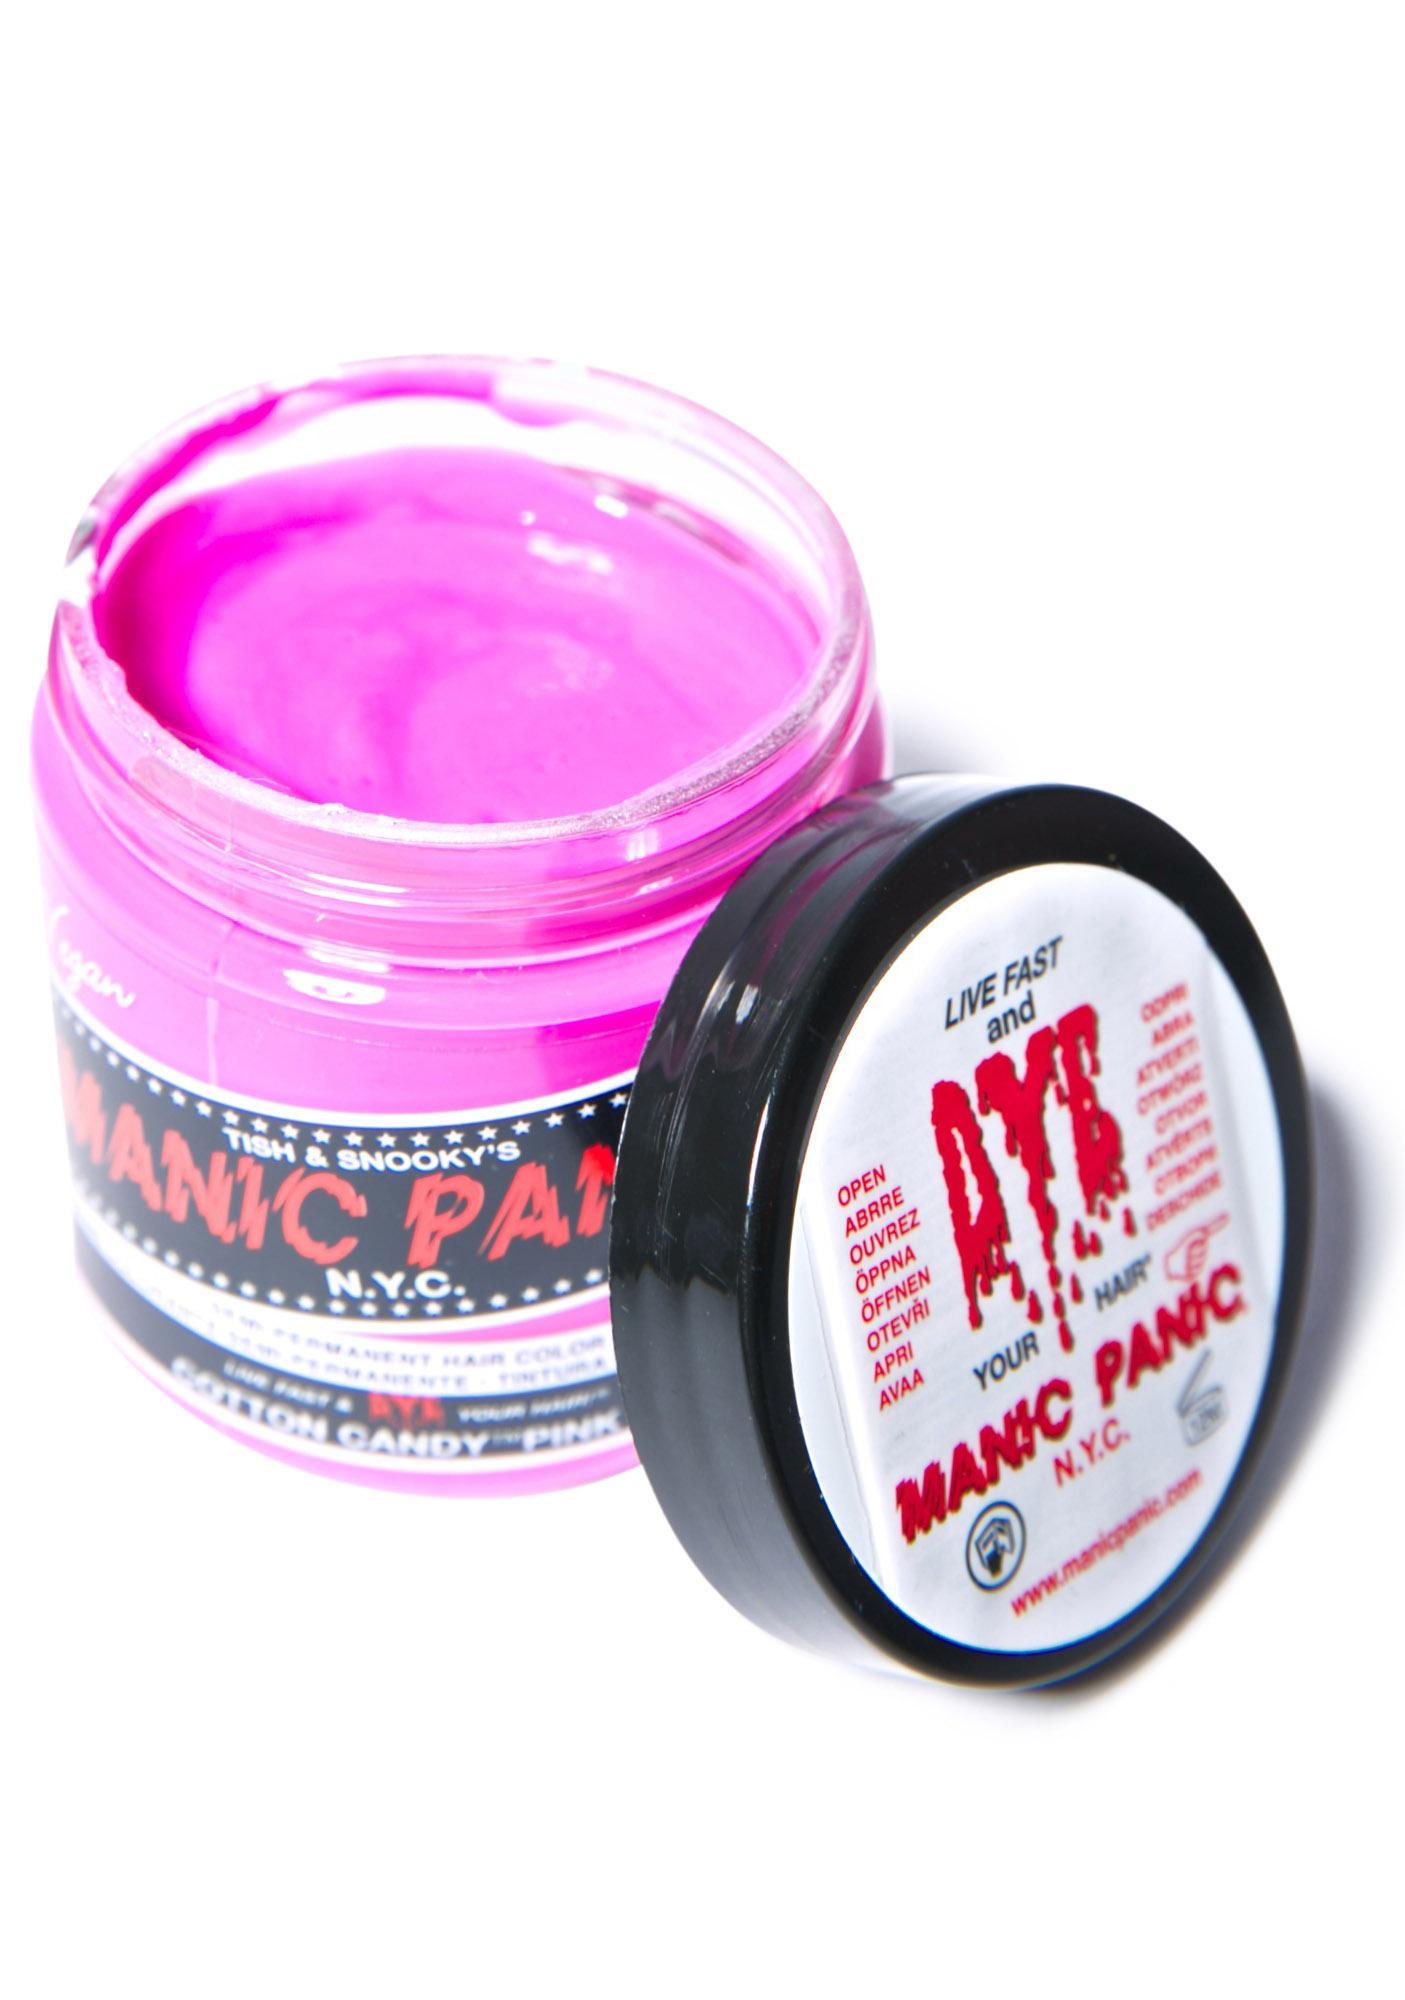 Manic Panic Cotton Candy Pink Classic Hair Dye